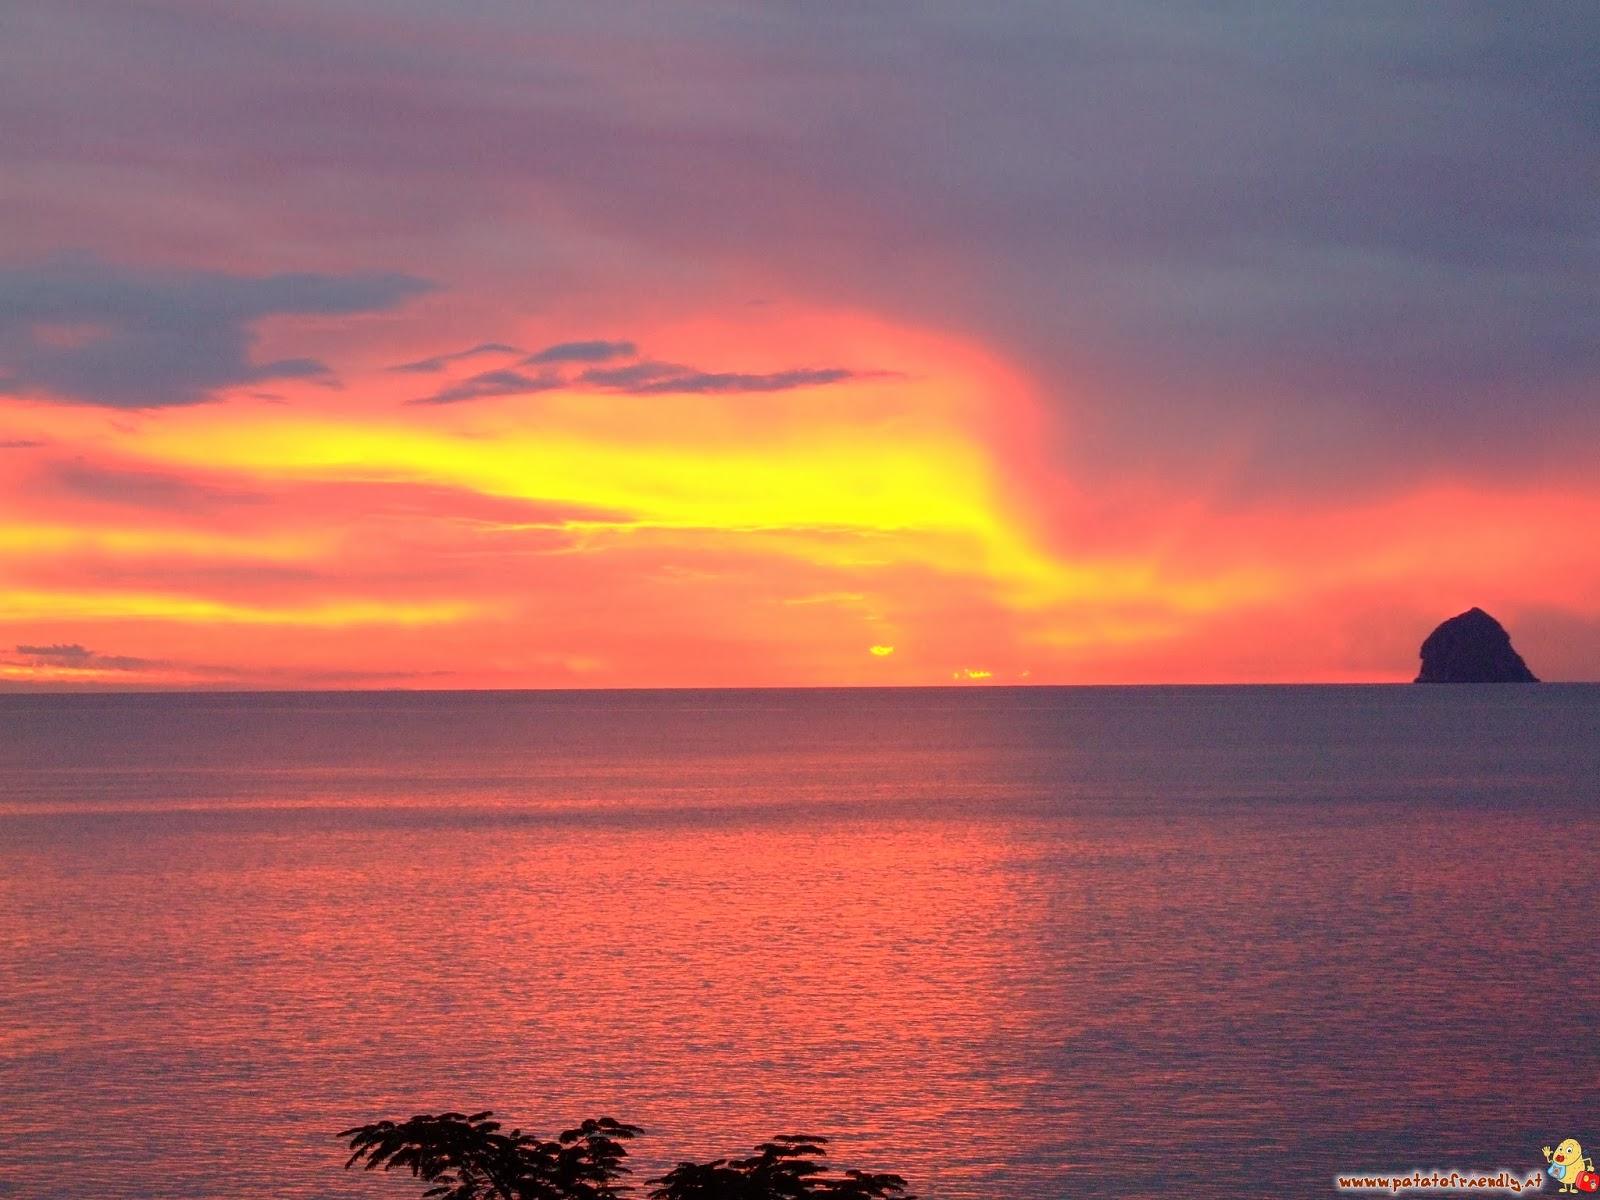 Lo splendido tramonto della Martinica durante la nostra baby-moon in gravidanza